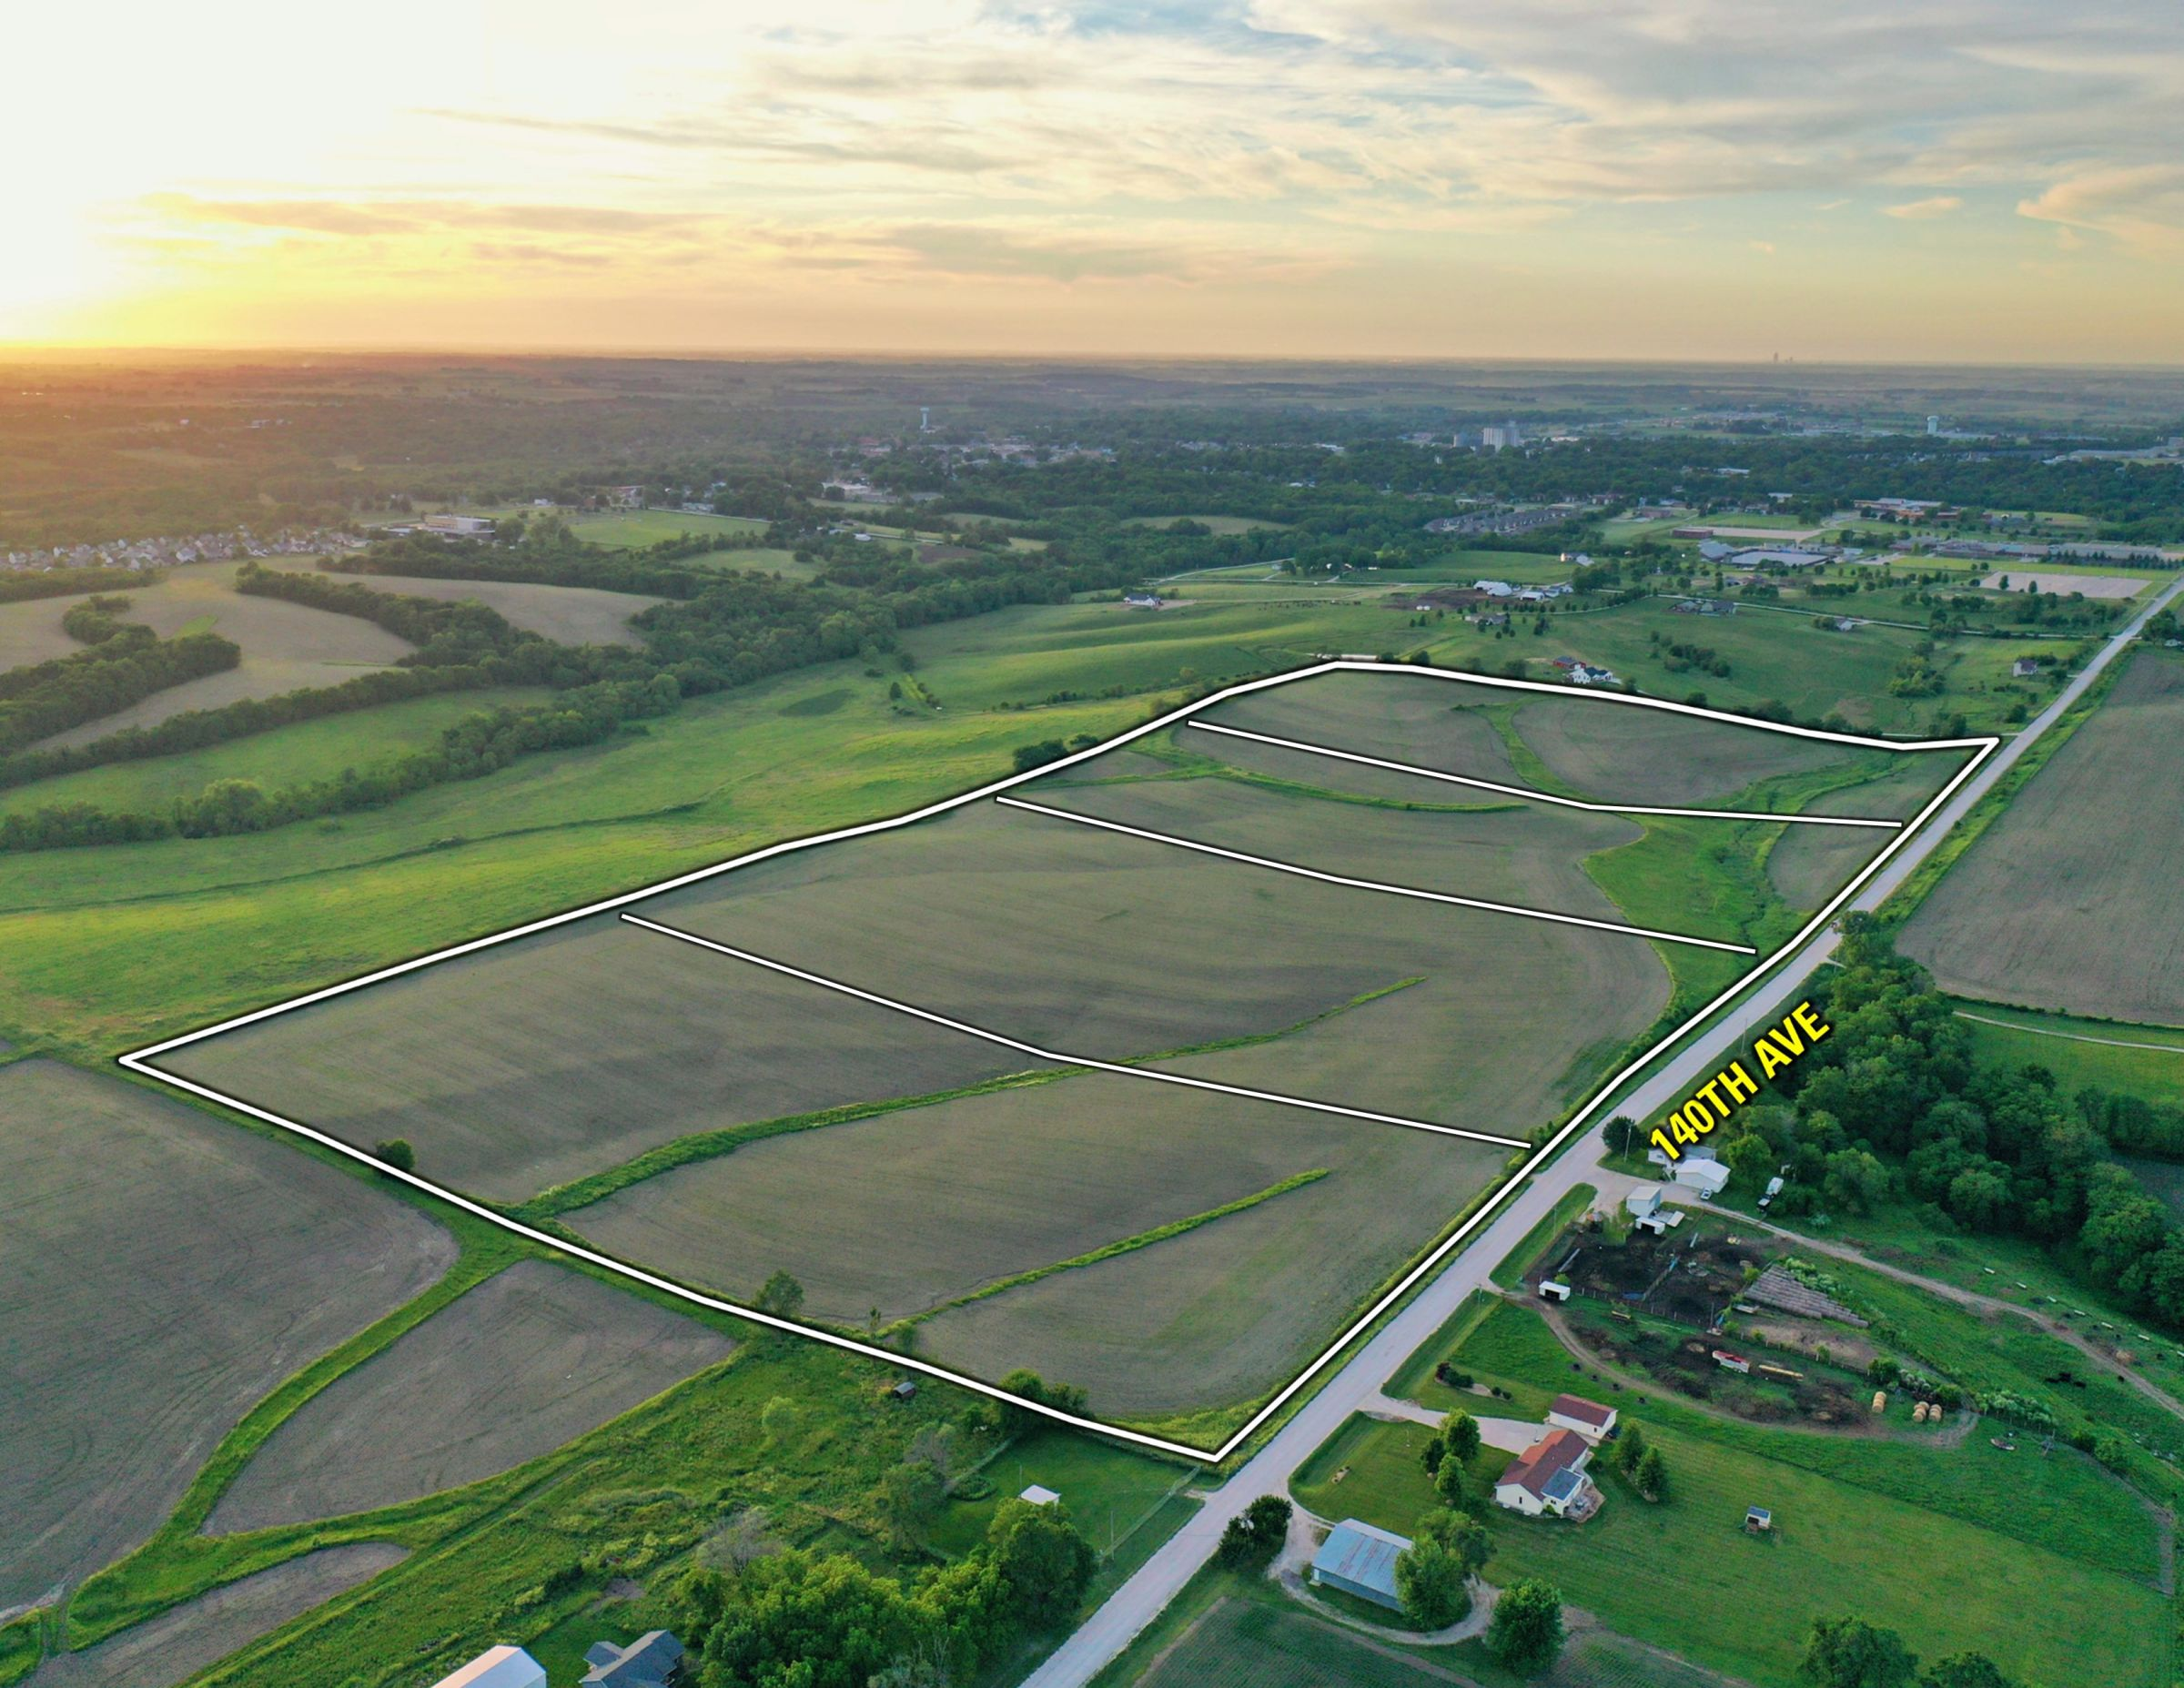 development-land-warren-county-iowa-20-acres-listing-number-15425-3-2021-03-26-185351.jpg